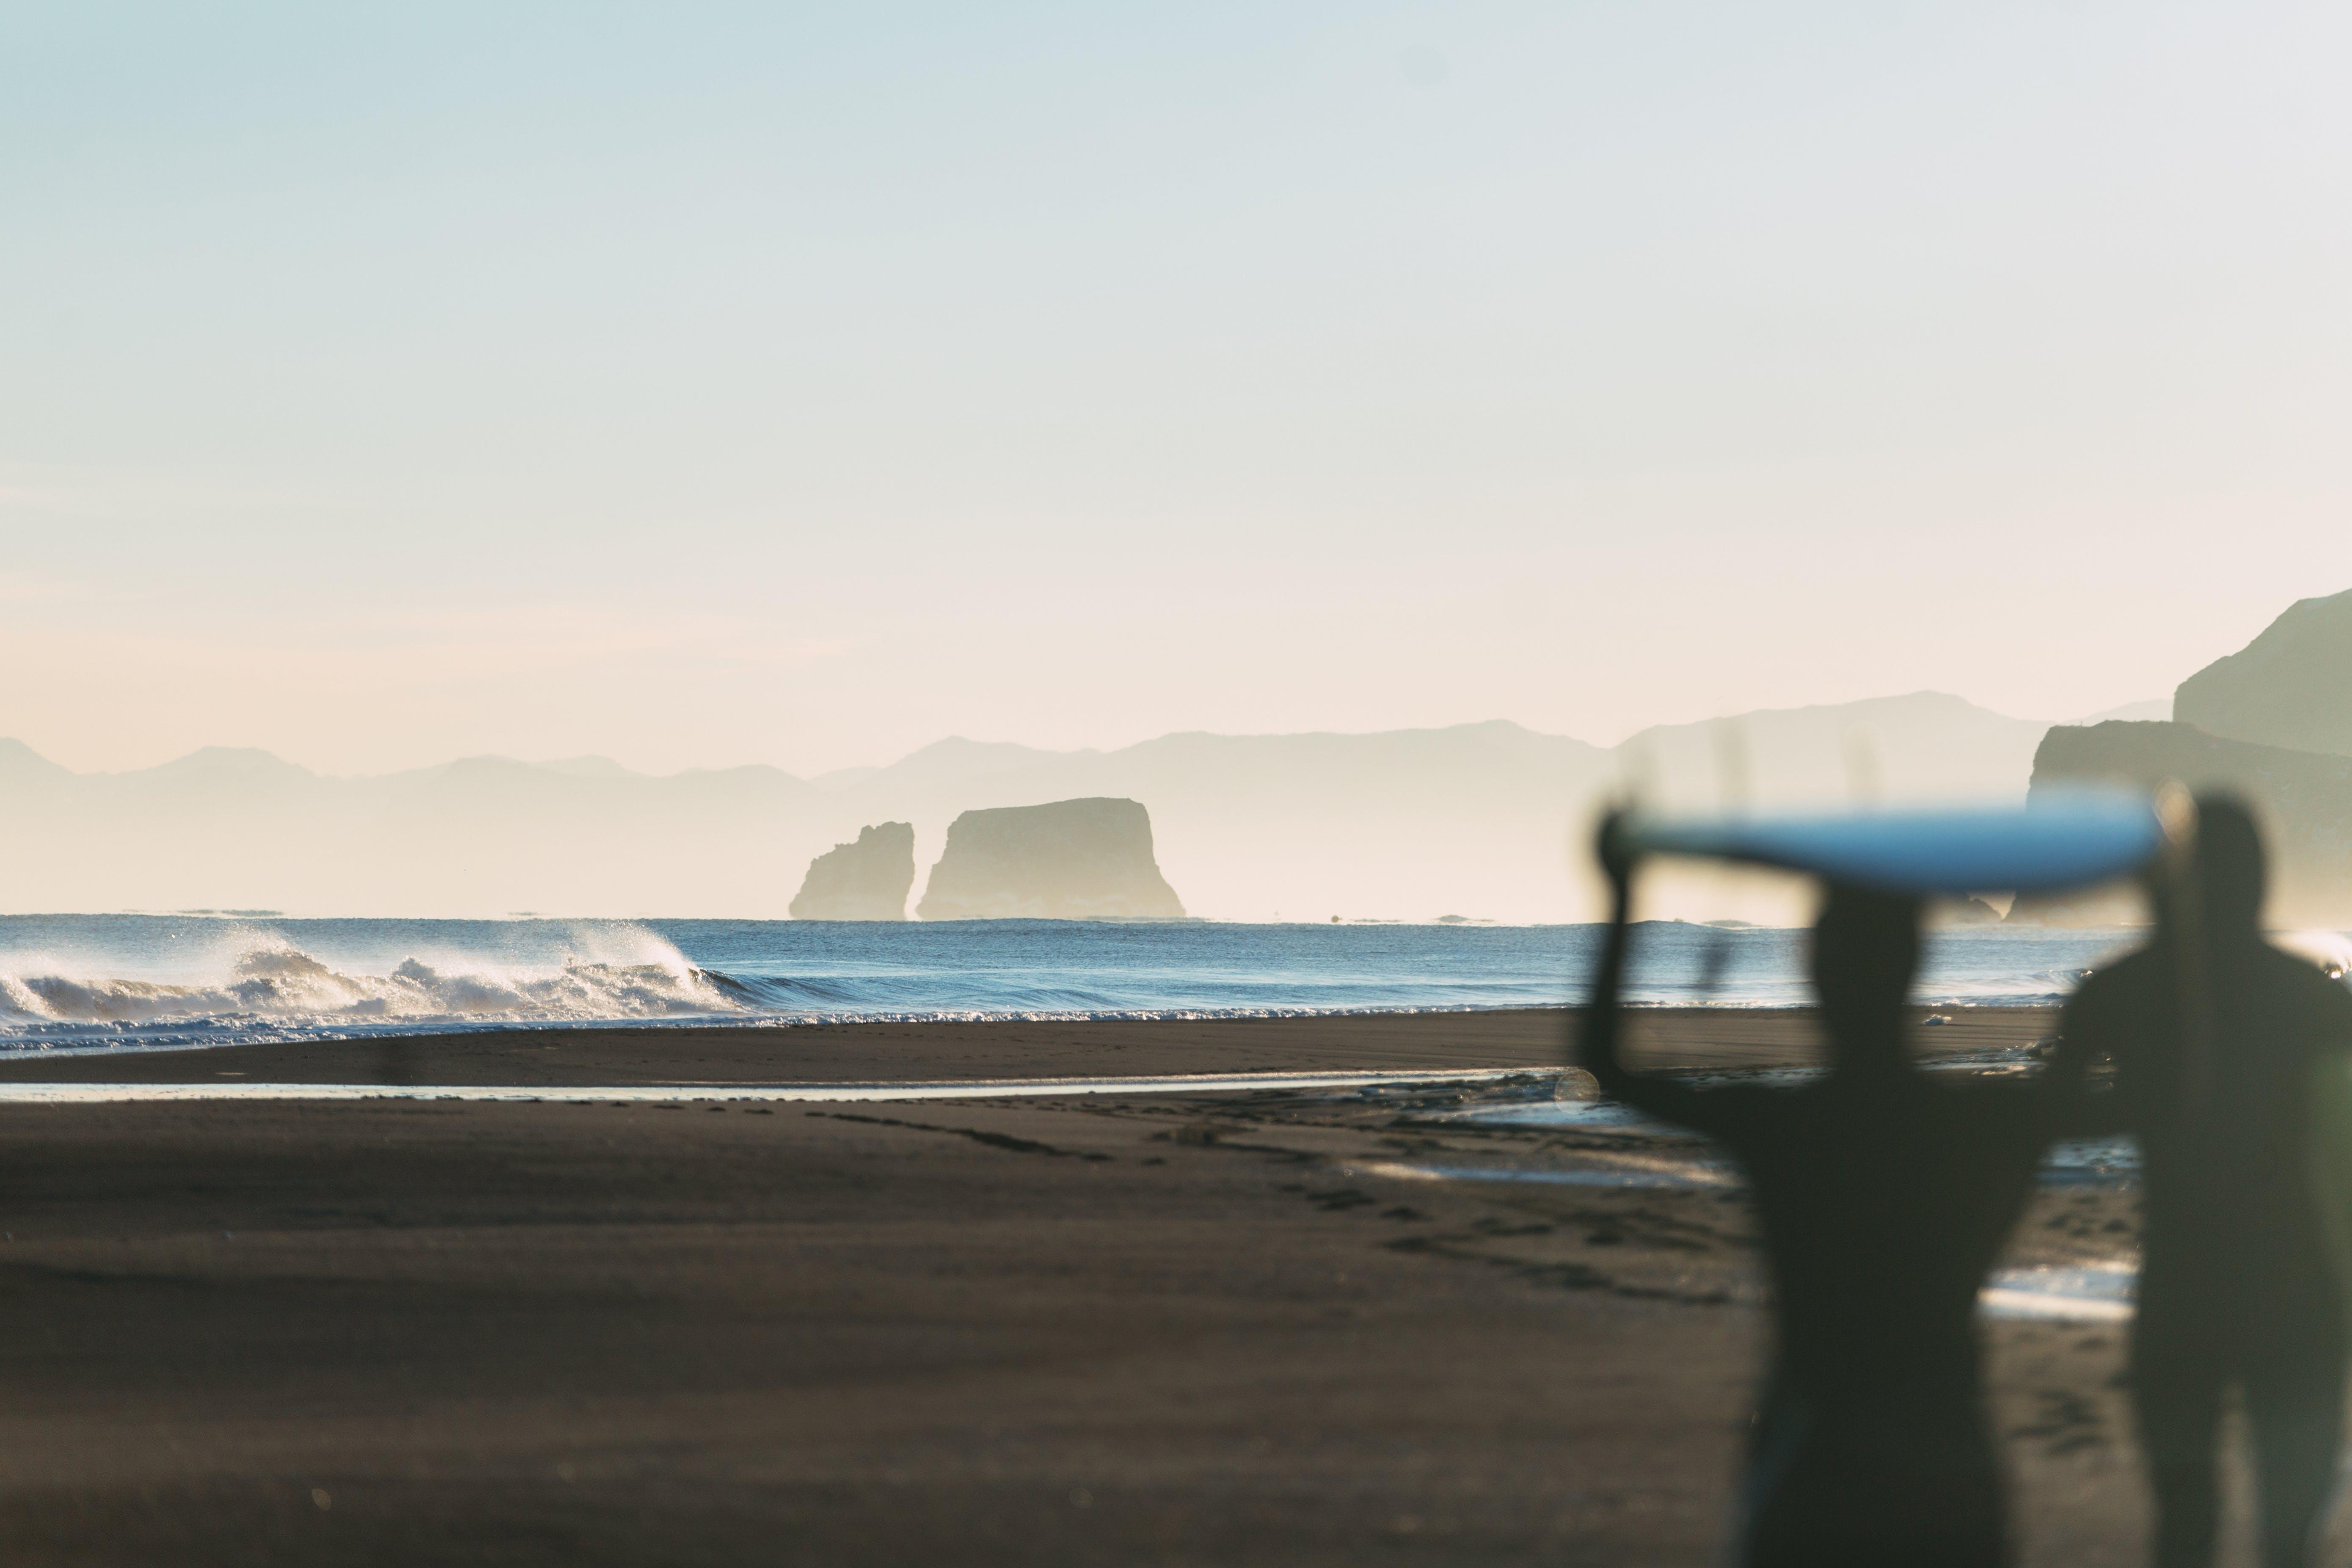 Silhouette of Person Holding Surfboard Near Seashore